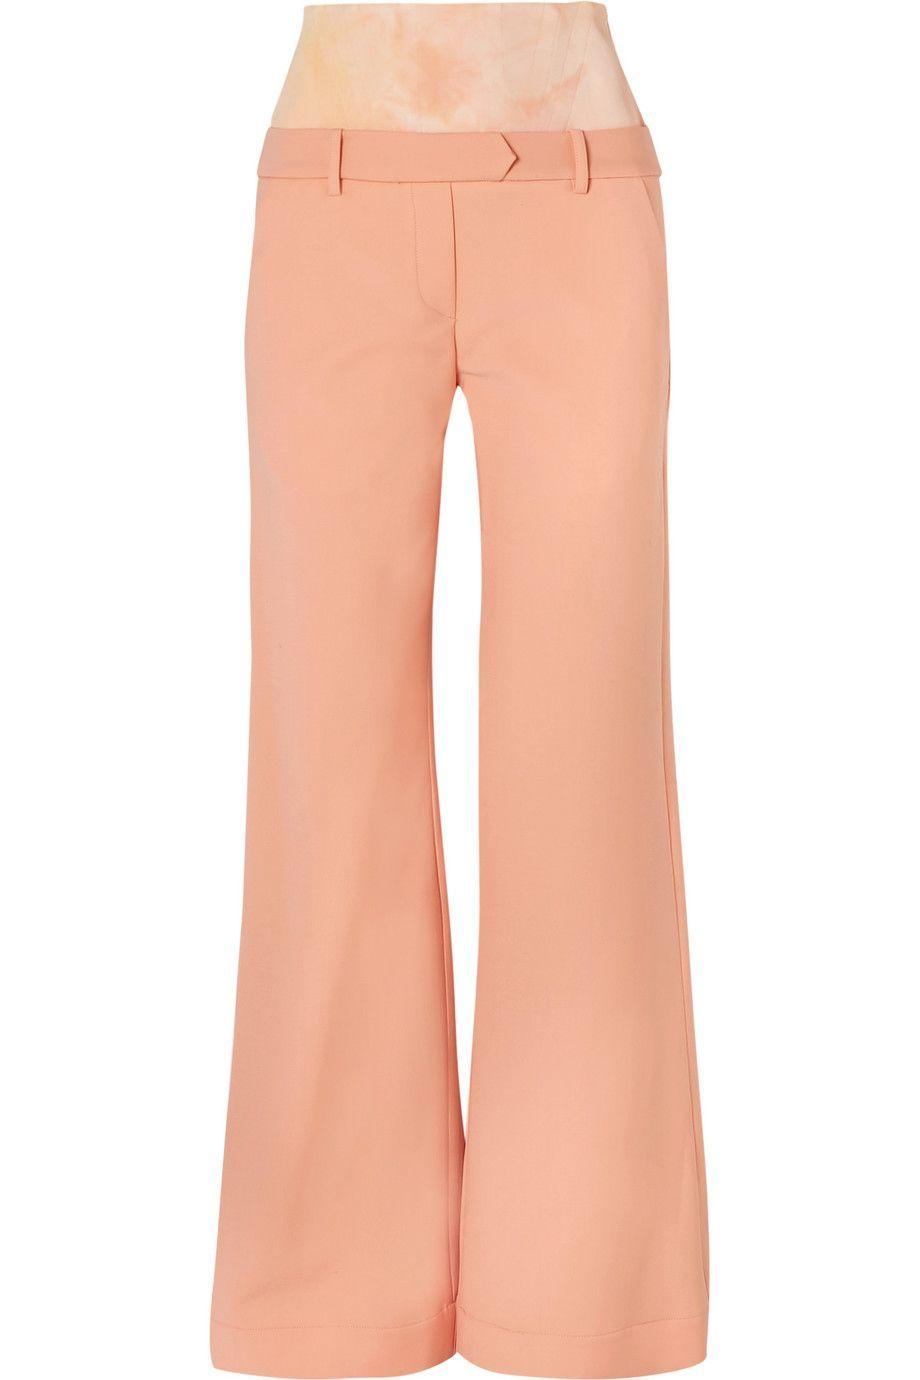 #PopbelaOOTD: Playful dengan Celana Warna-warni